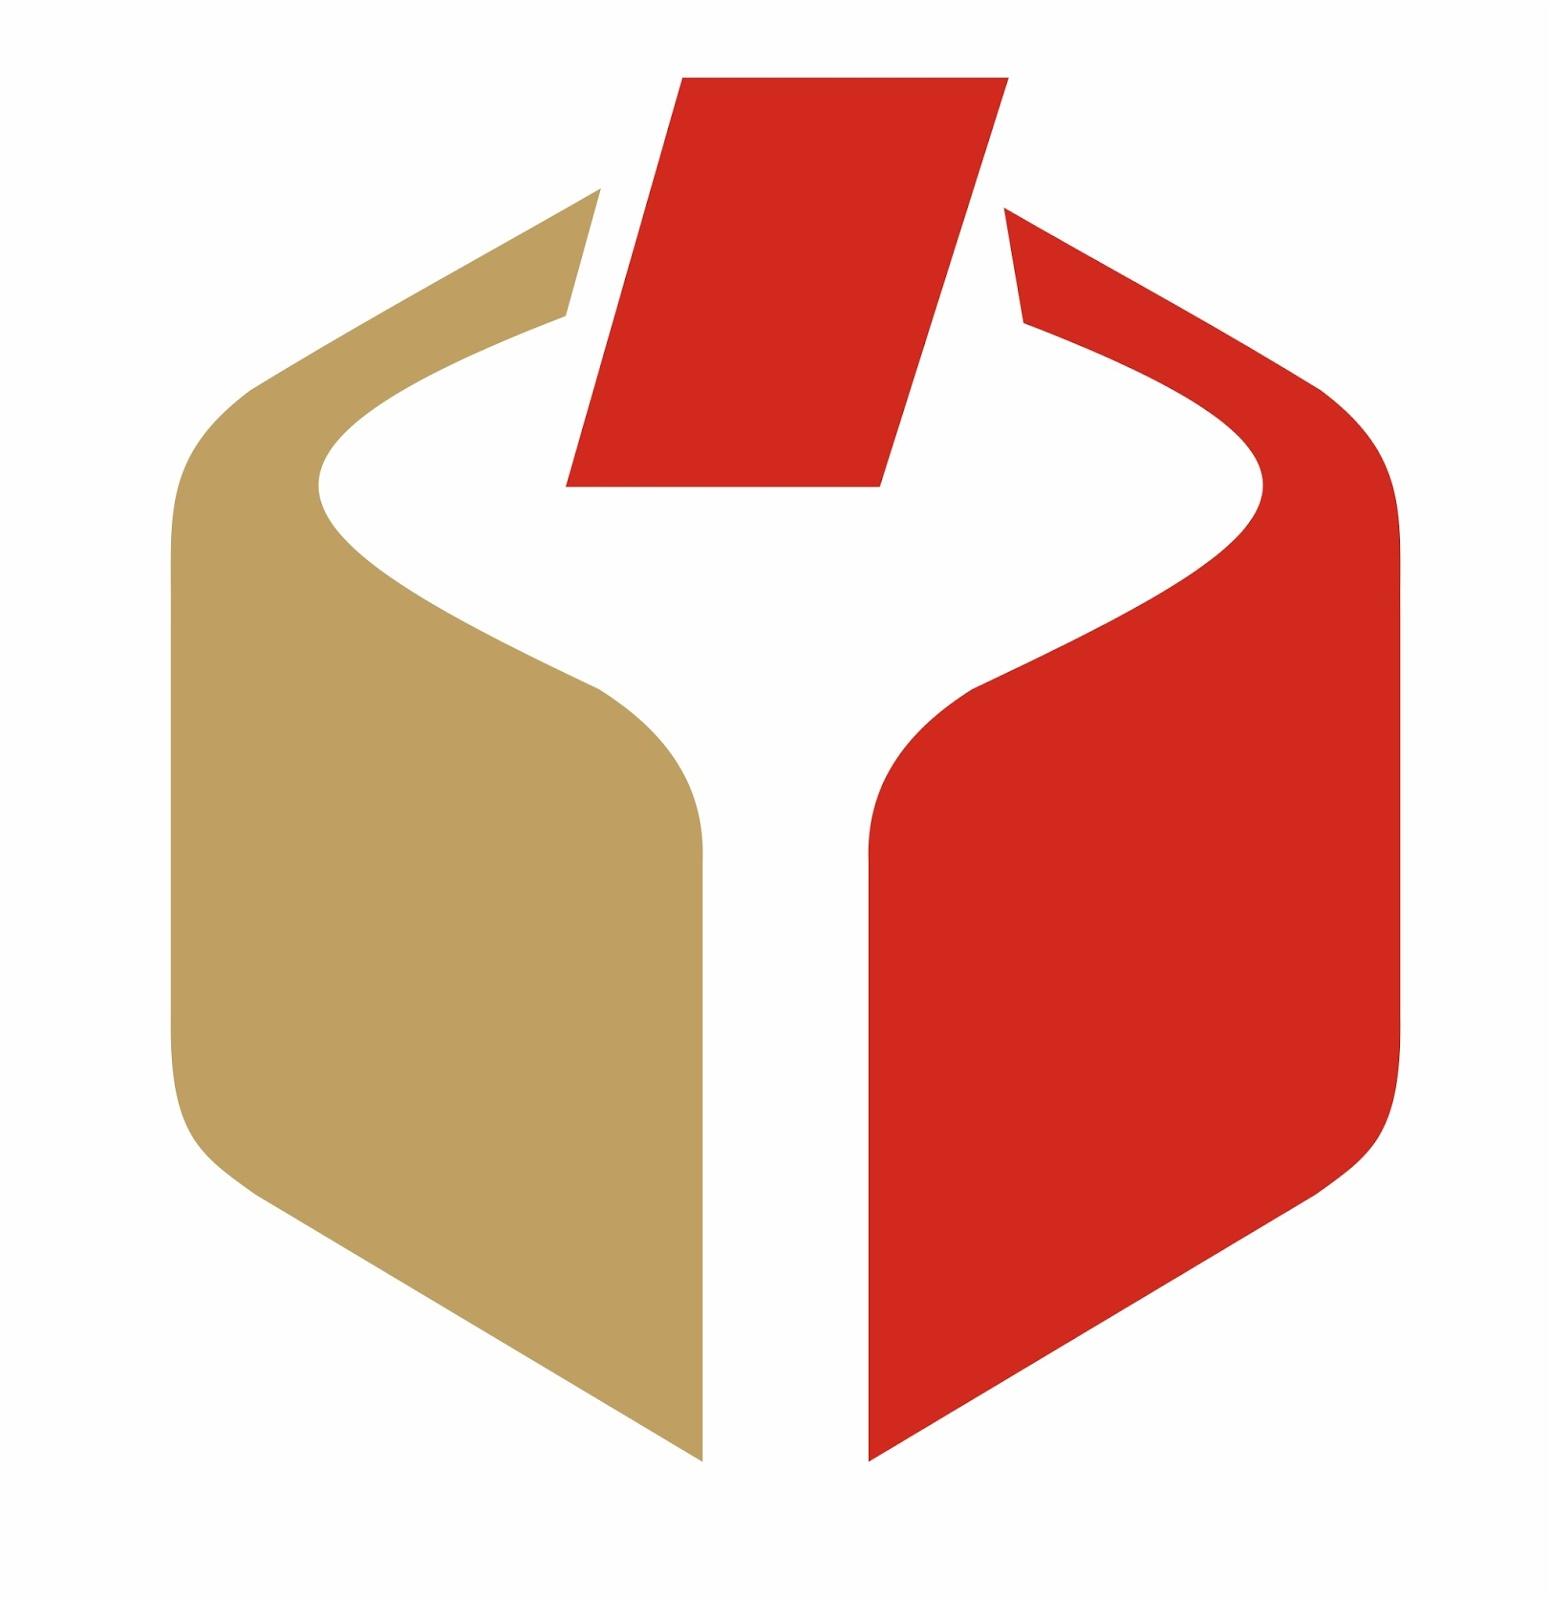 Urgensi Dibalik Logo Baru Bawaslu ~ Panwaslu Majalengka